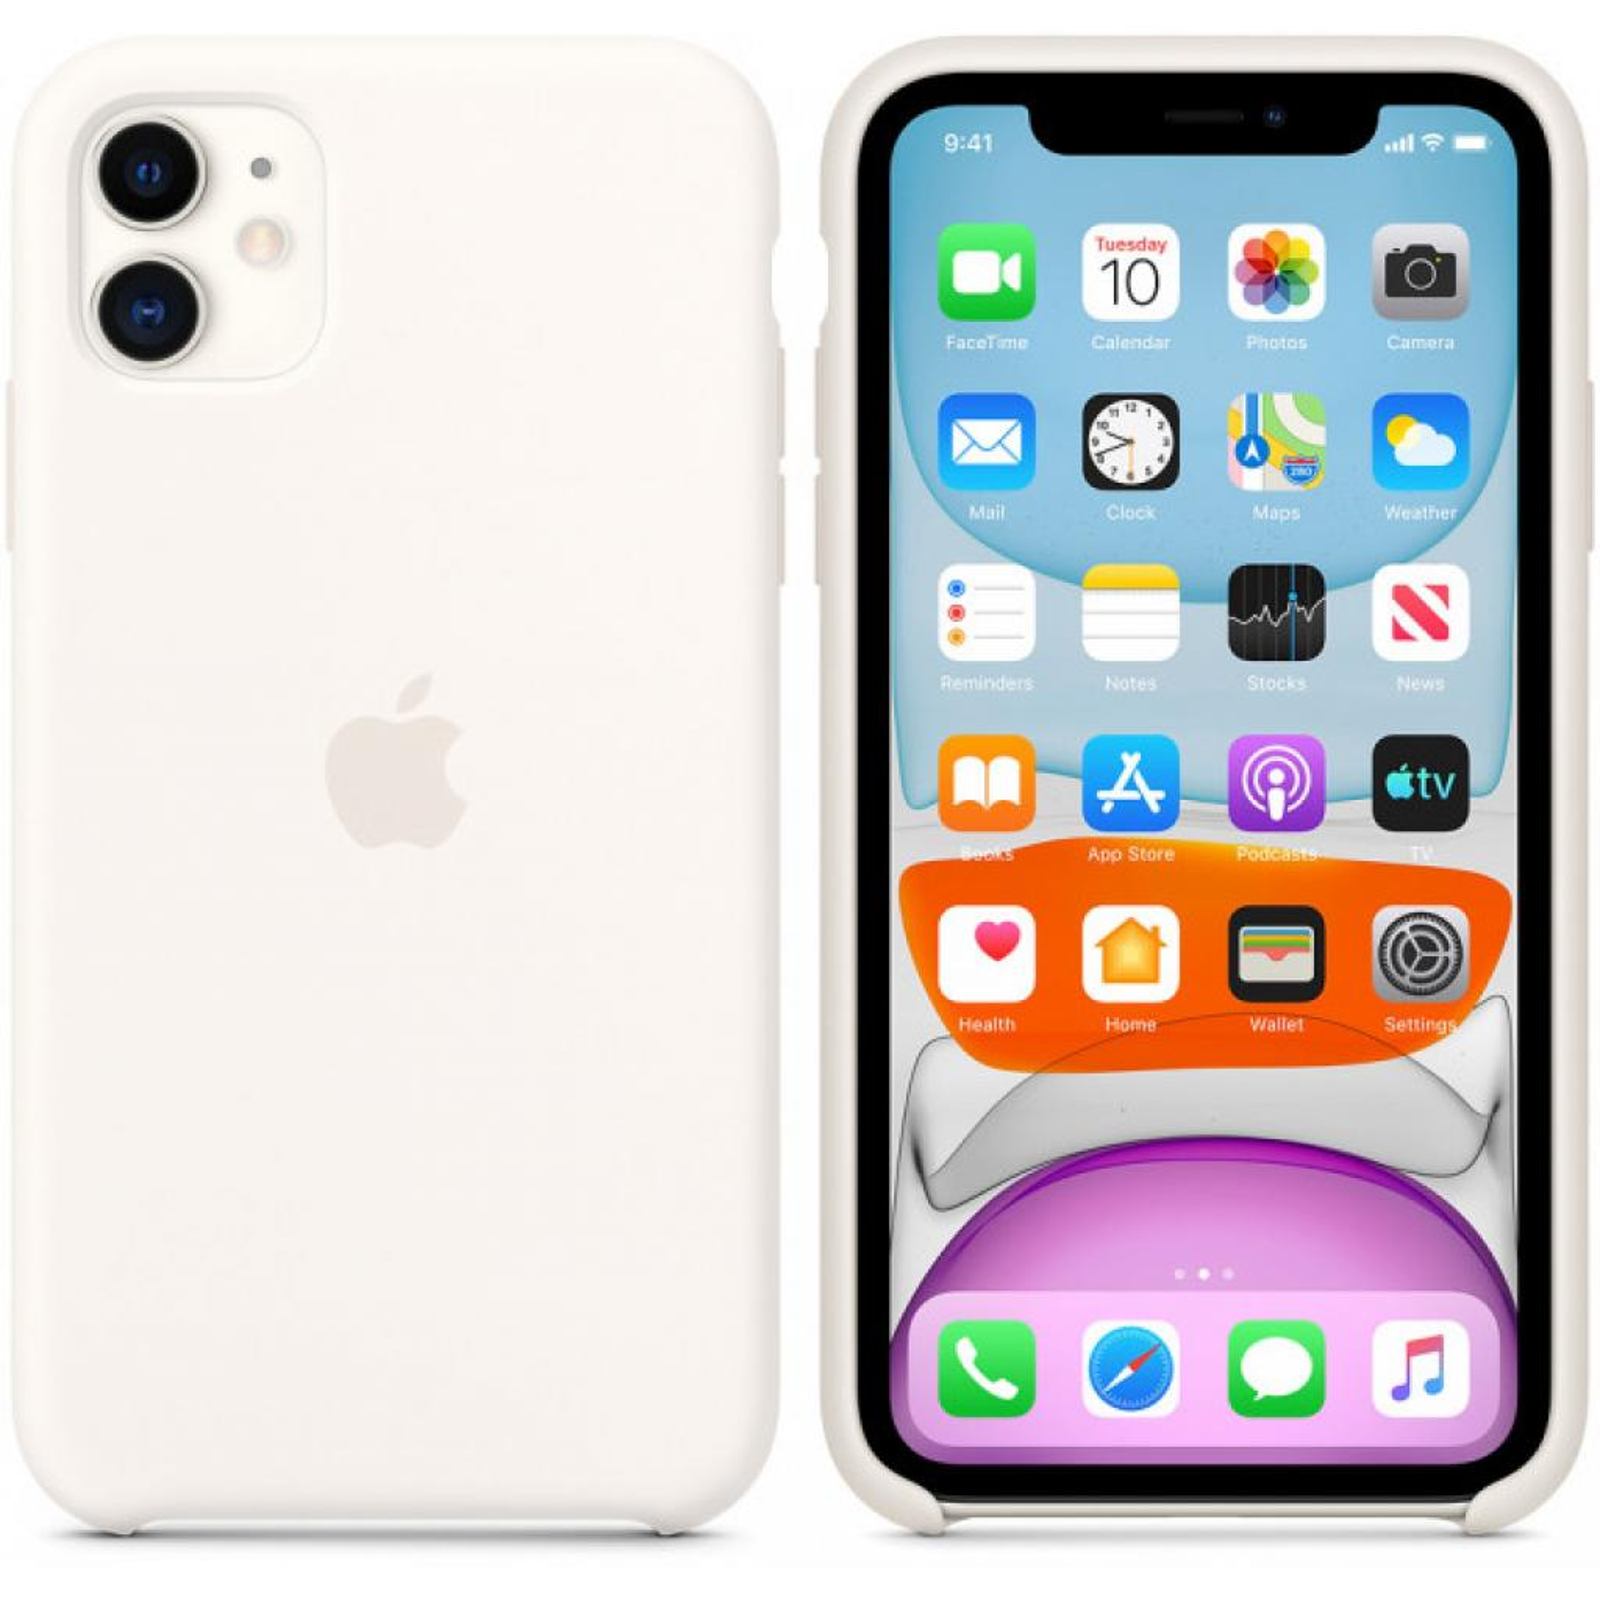 Чехол для моб. телефона Apple iPhone 11 Silicone Case - Black (MWVU2ZM/A) изображение 6